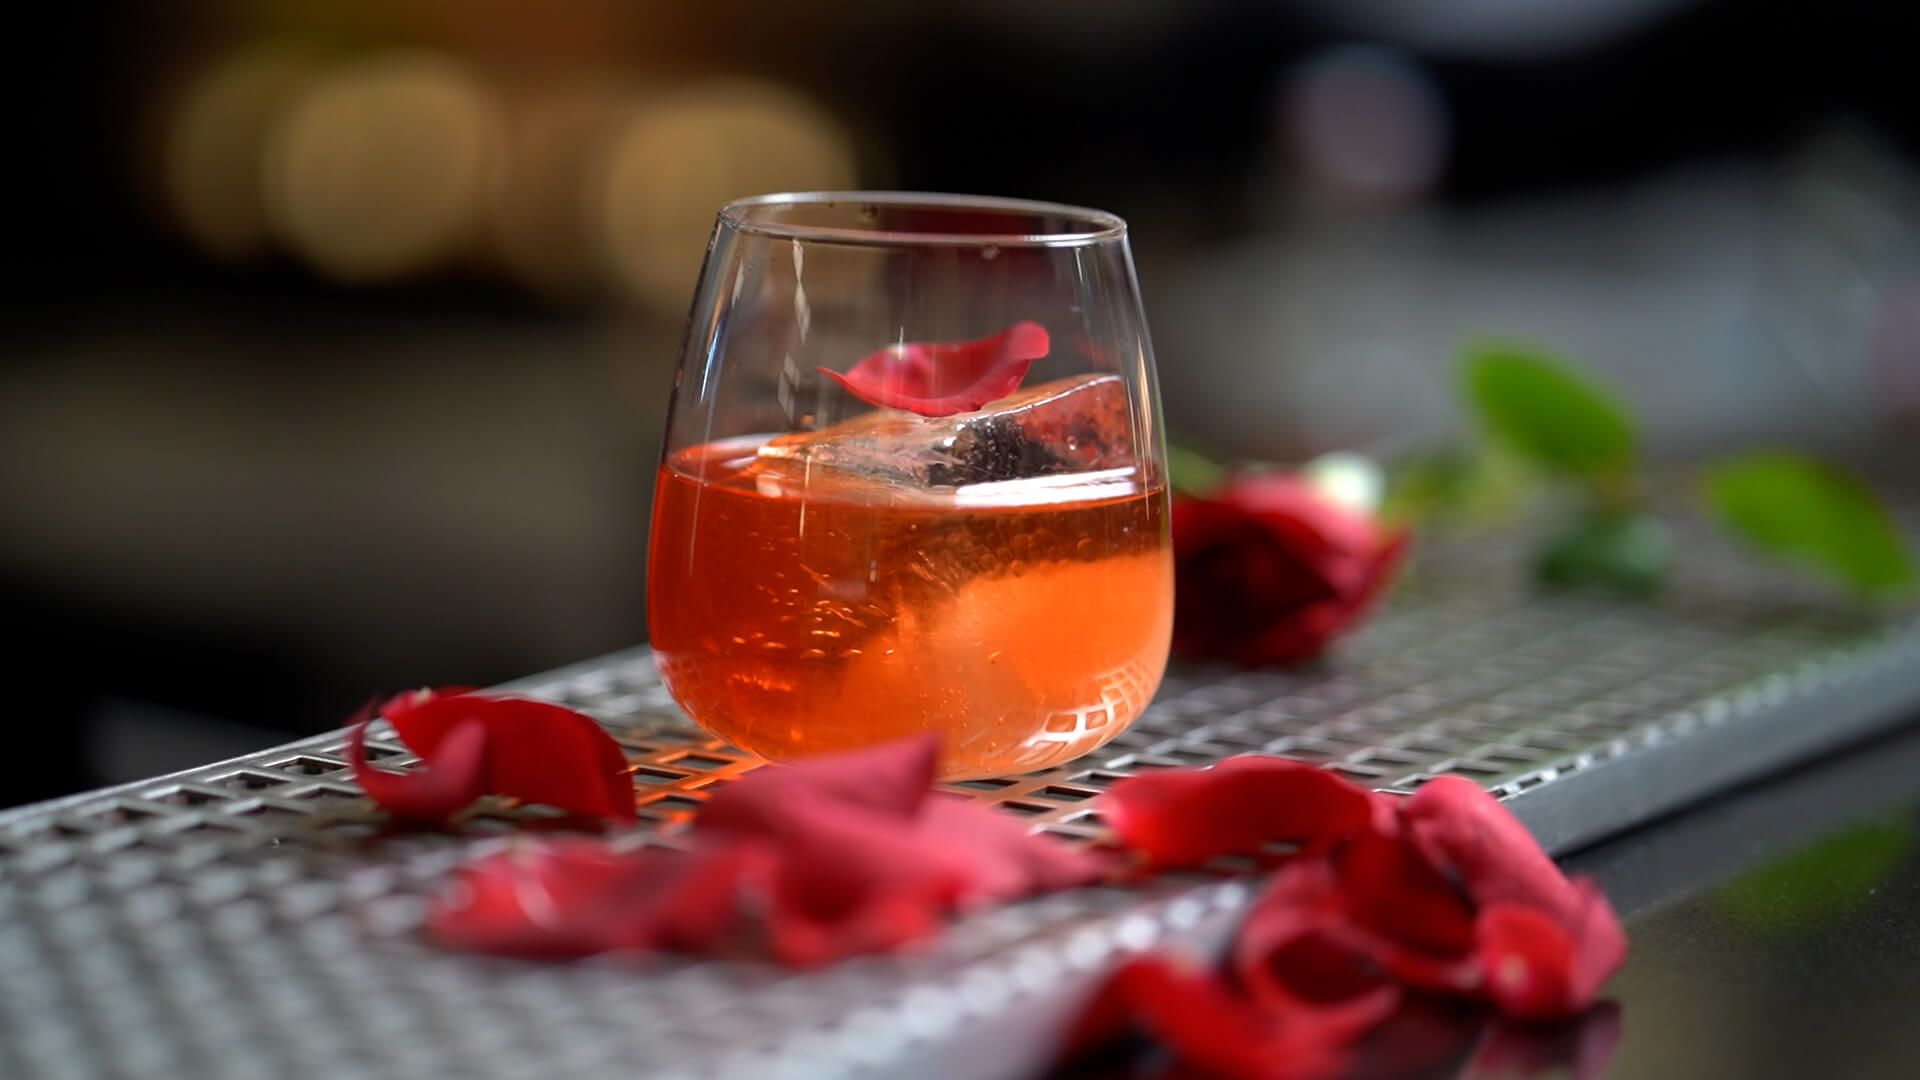 strawberry-rose-negroni-cocktail